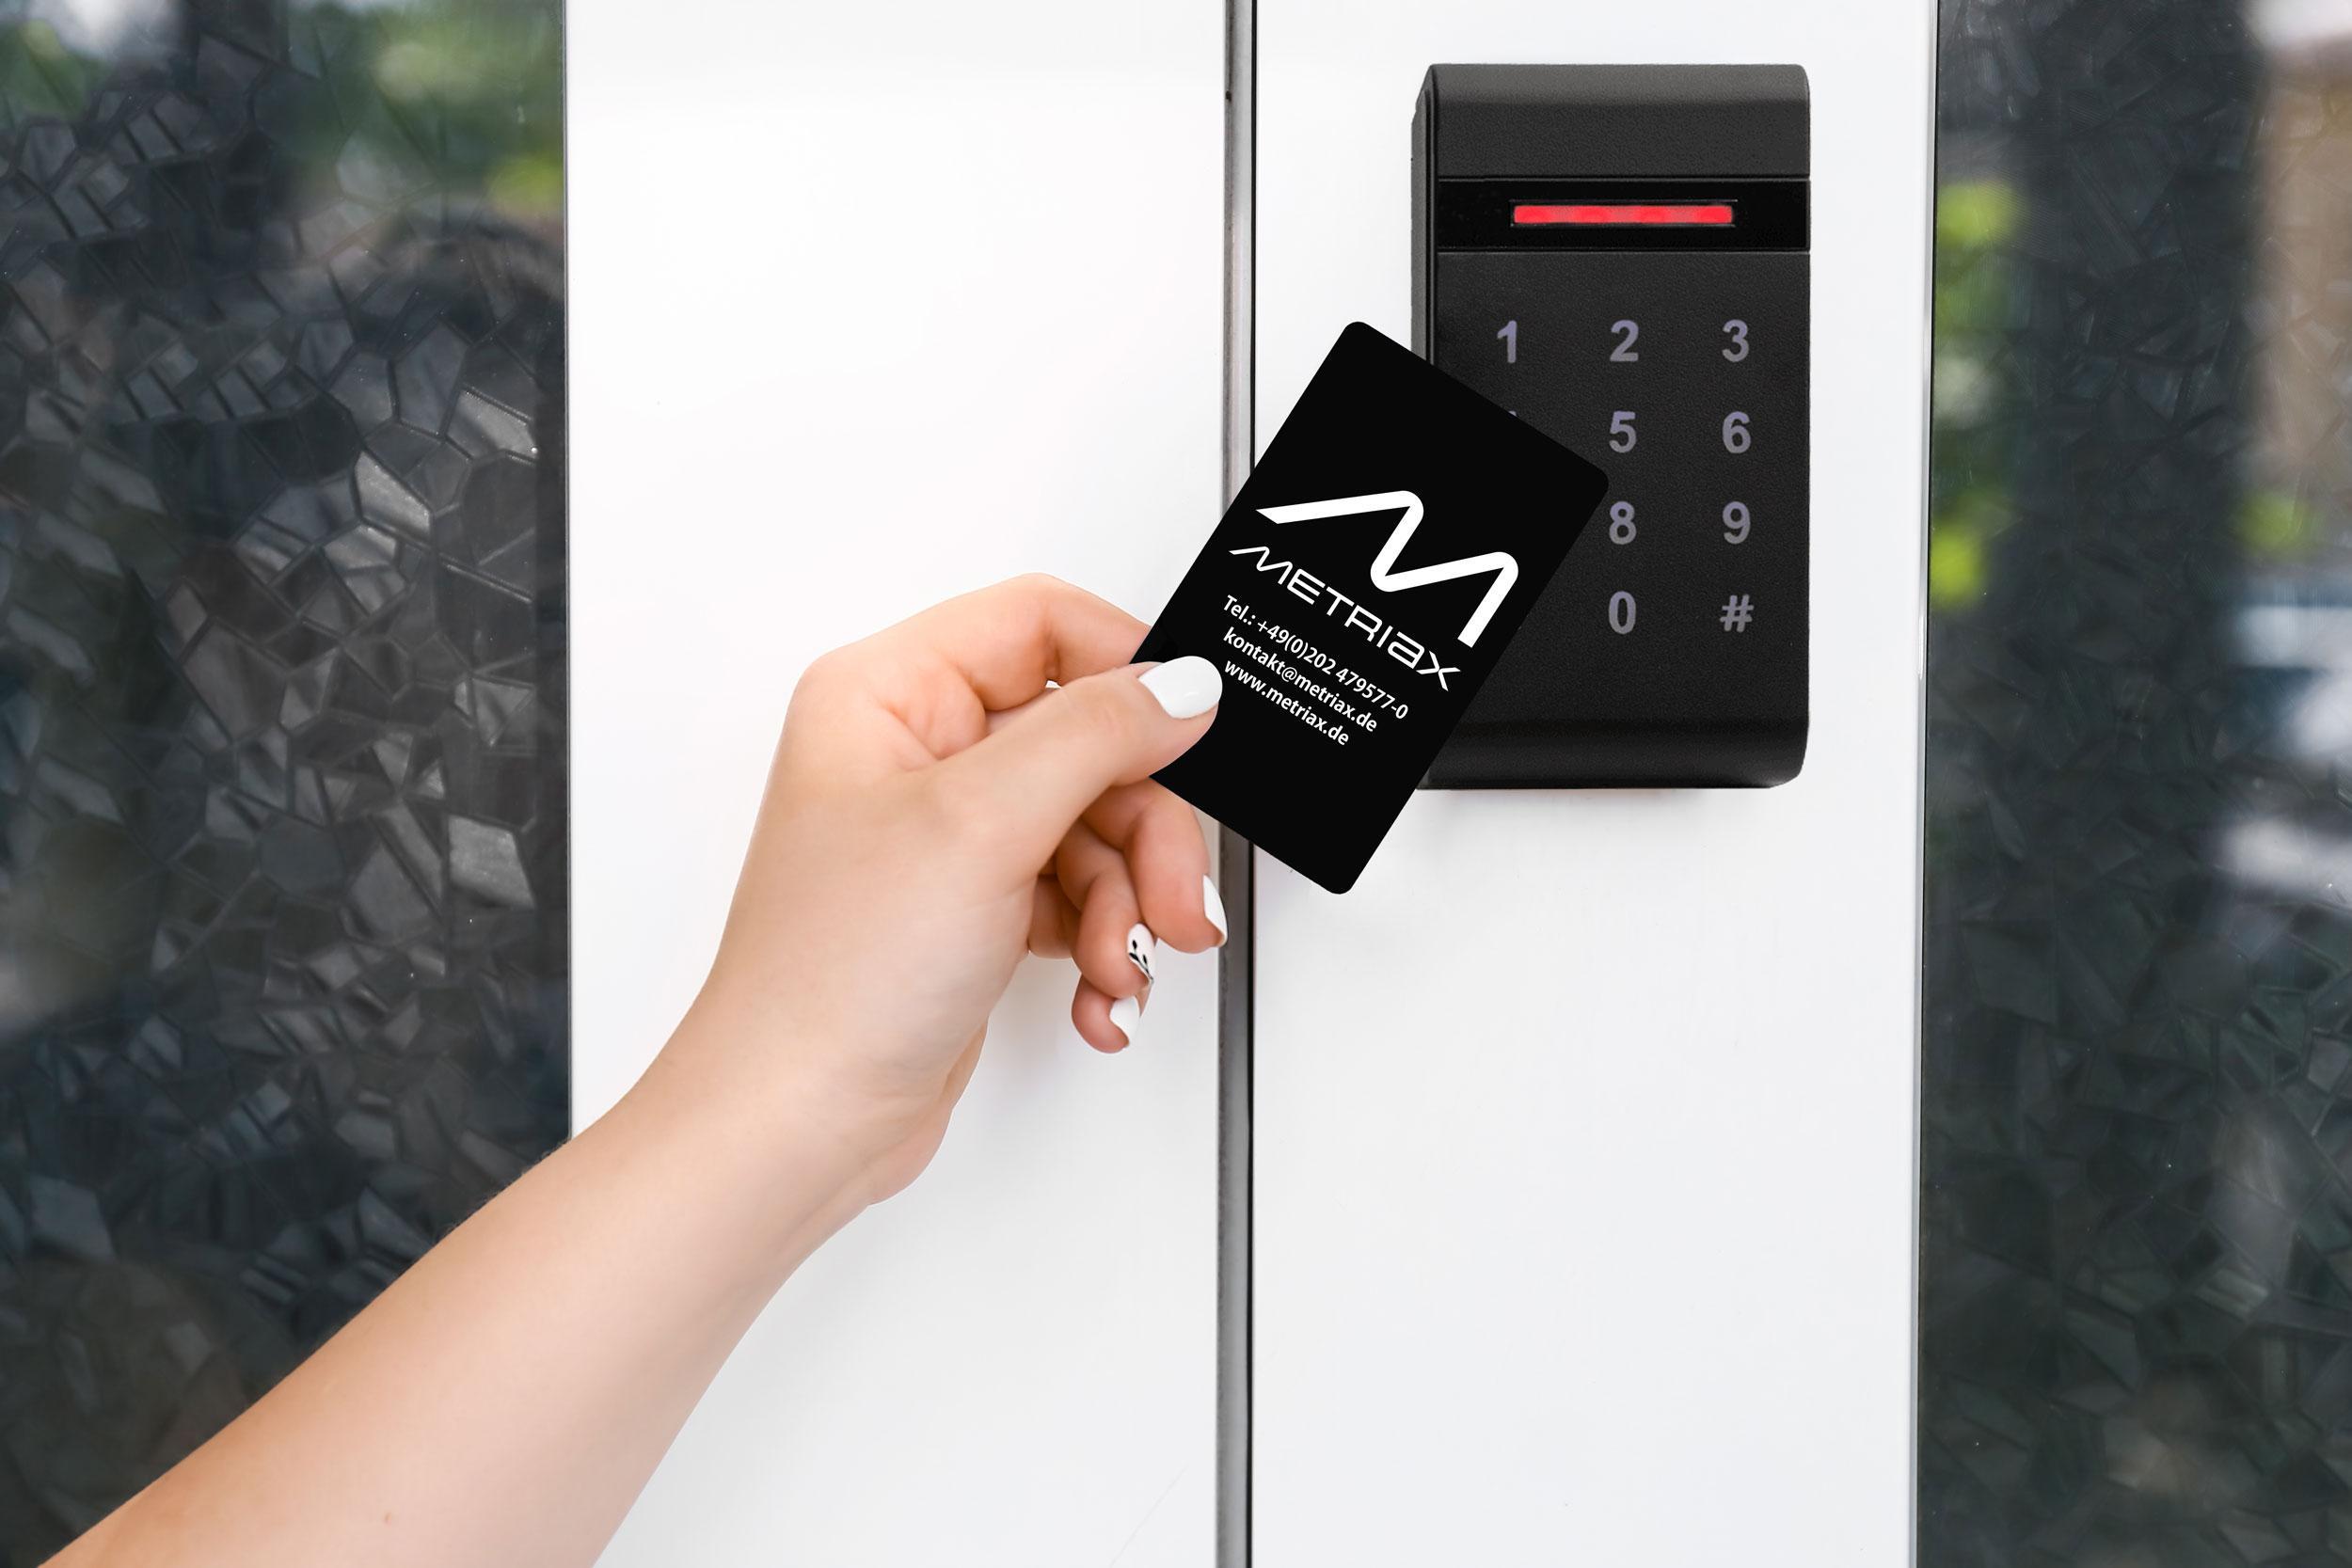 MDE 960-Metriax-RFID-NFC-Reader-Schlüsselkarte-Zutrittskontrolle